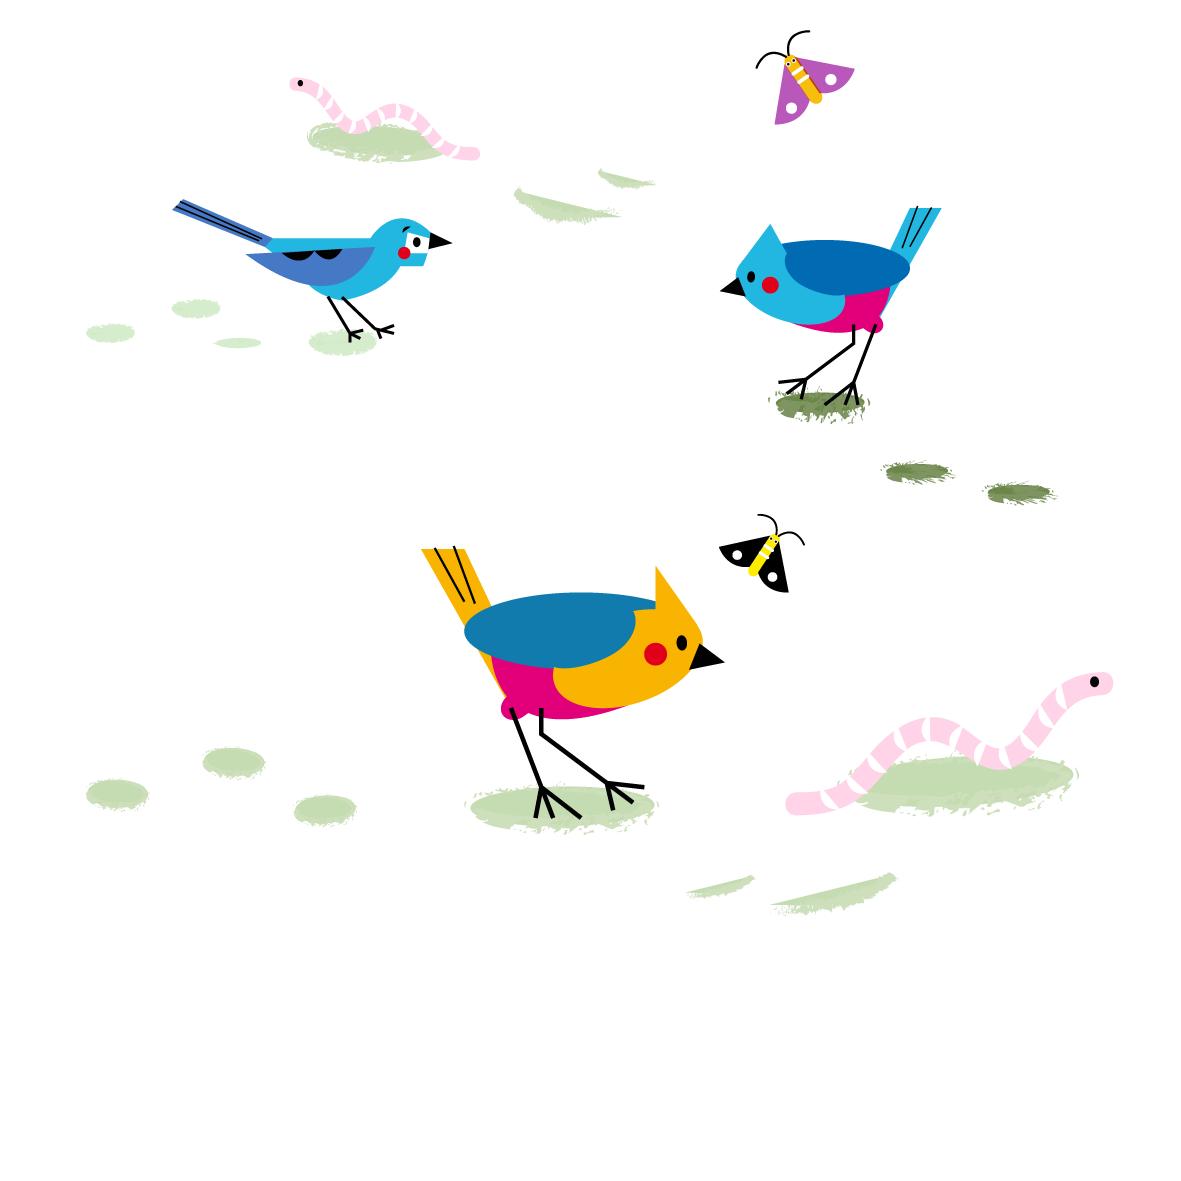 Birds - Vector Illustration © Emeline Barrea, All rights reserved